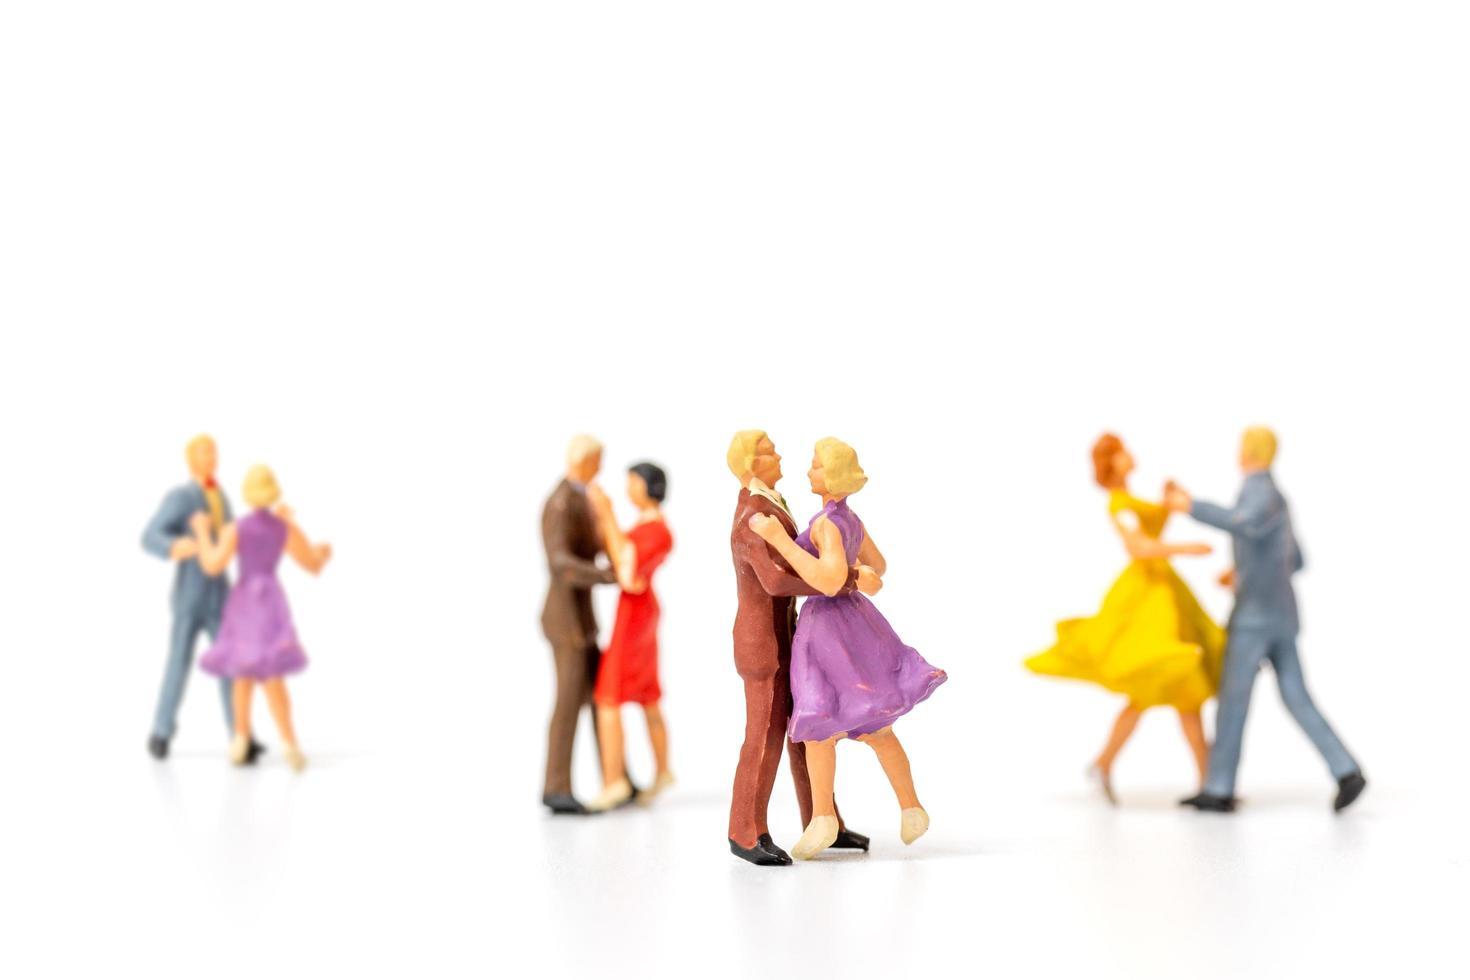 miniatuurmensen dansen op s witte achtergrond, Valentijnsdag concept foto